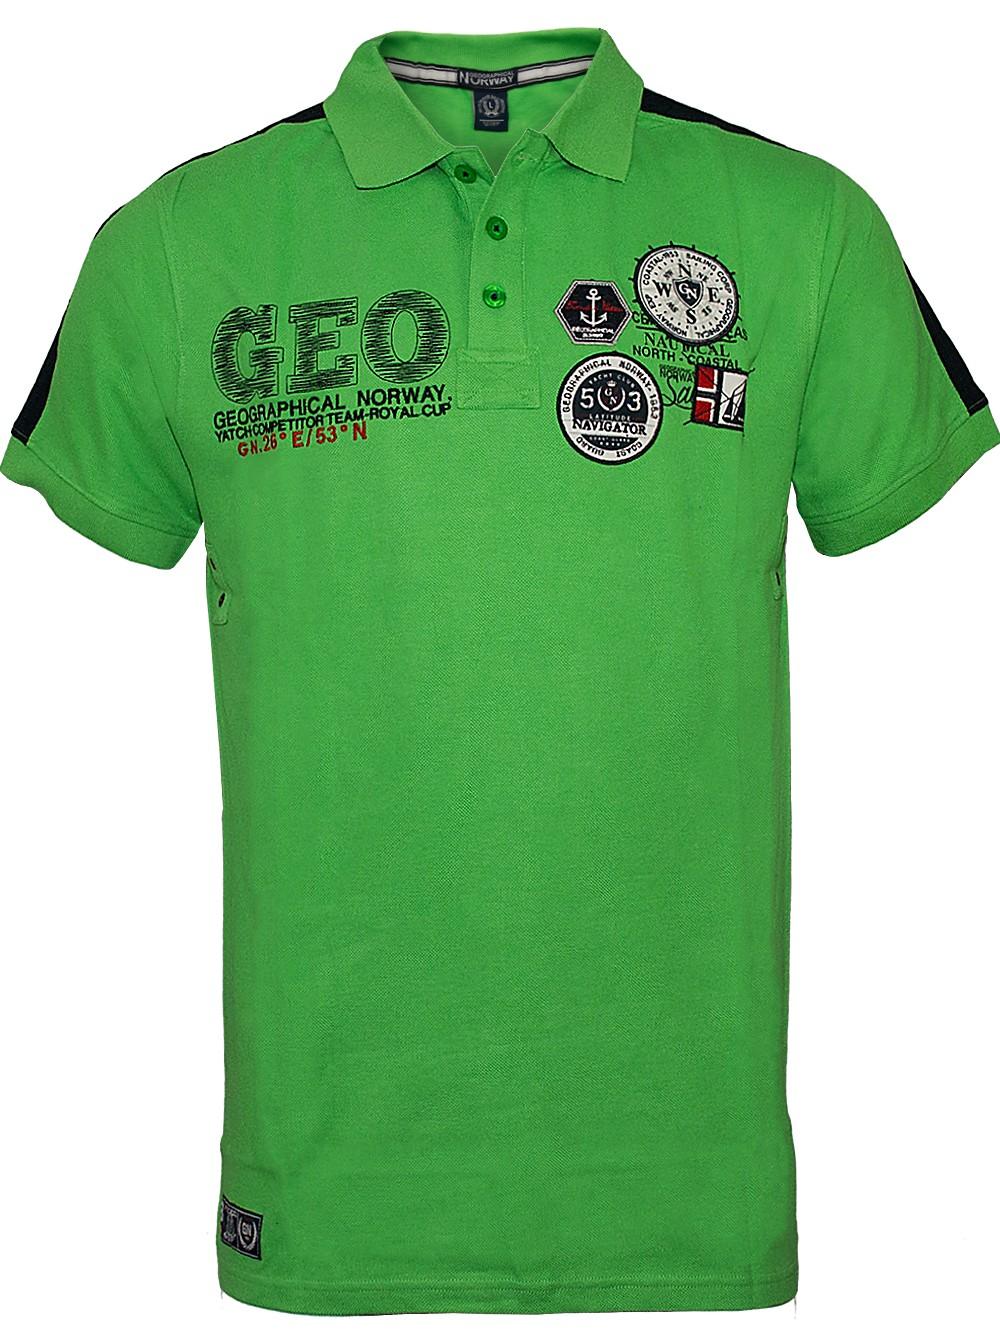 2f9208b83775ea Herren Poloshirt Katal (grün)